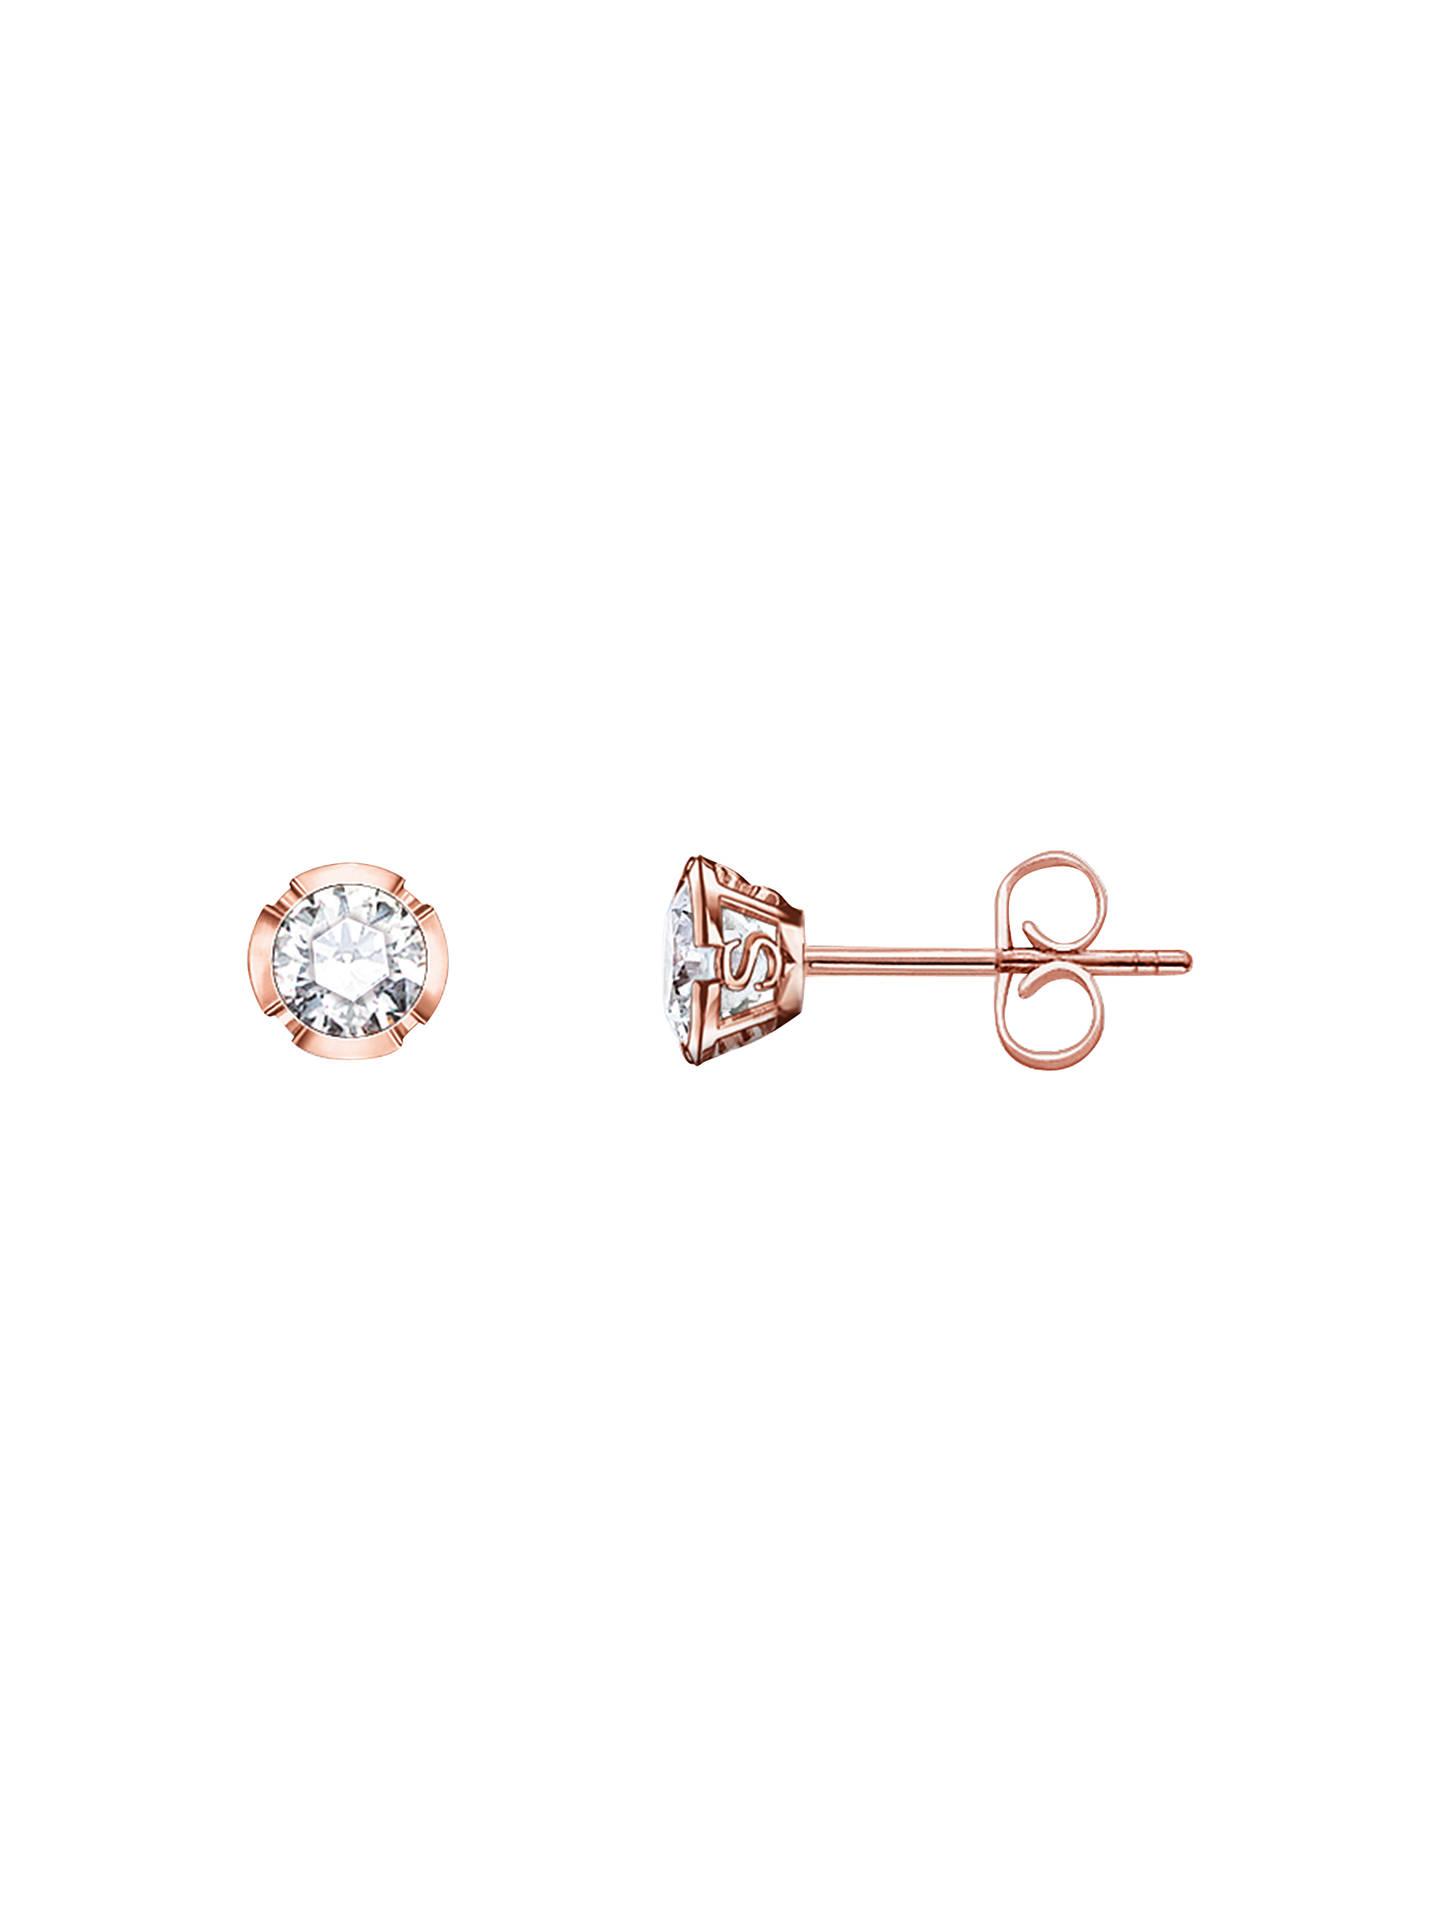 963d18198 Buy Thomas Sabo Glam & Soul Zirconia Stud Earrings, Rose Gold Online at  johnlewis.